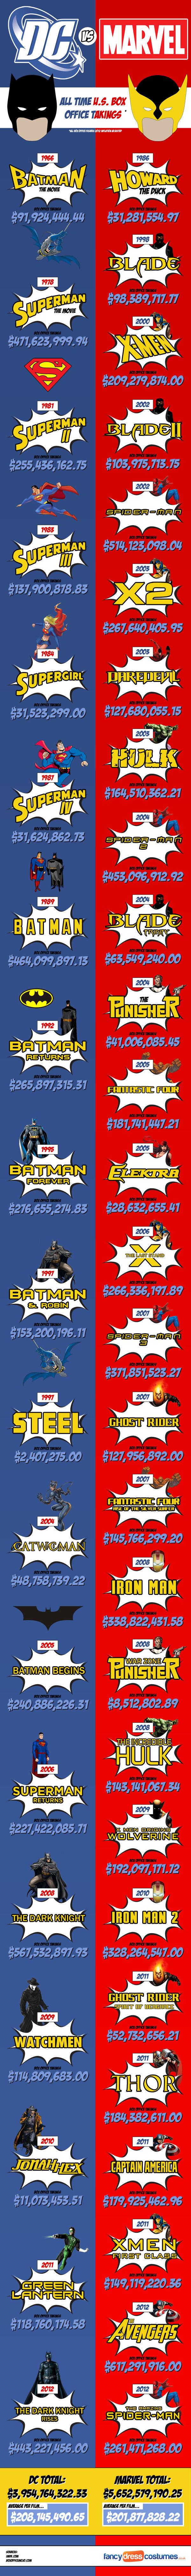 Marvel Vs DC At The Box Office SR Geek Picks: Bane is Your Boss, Marvel vs DC at the Box Office, Dr. Seuss Star Wars & More!